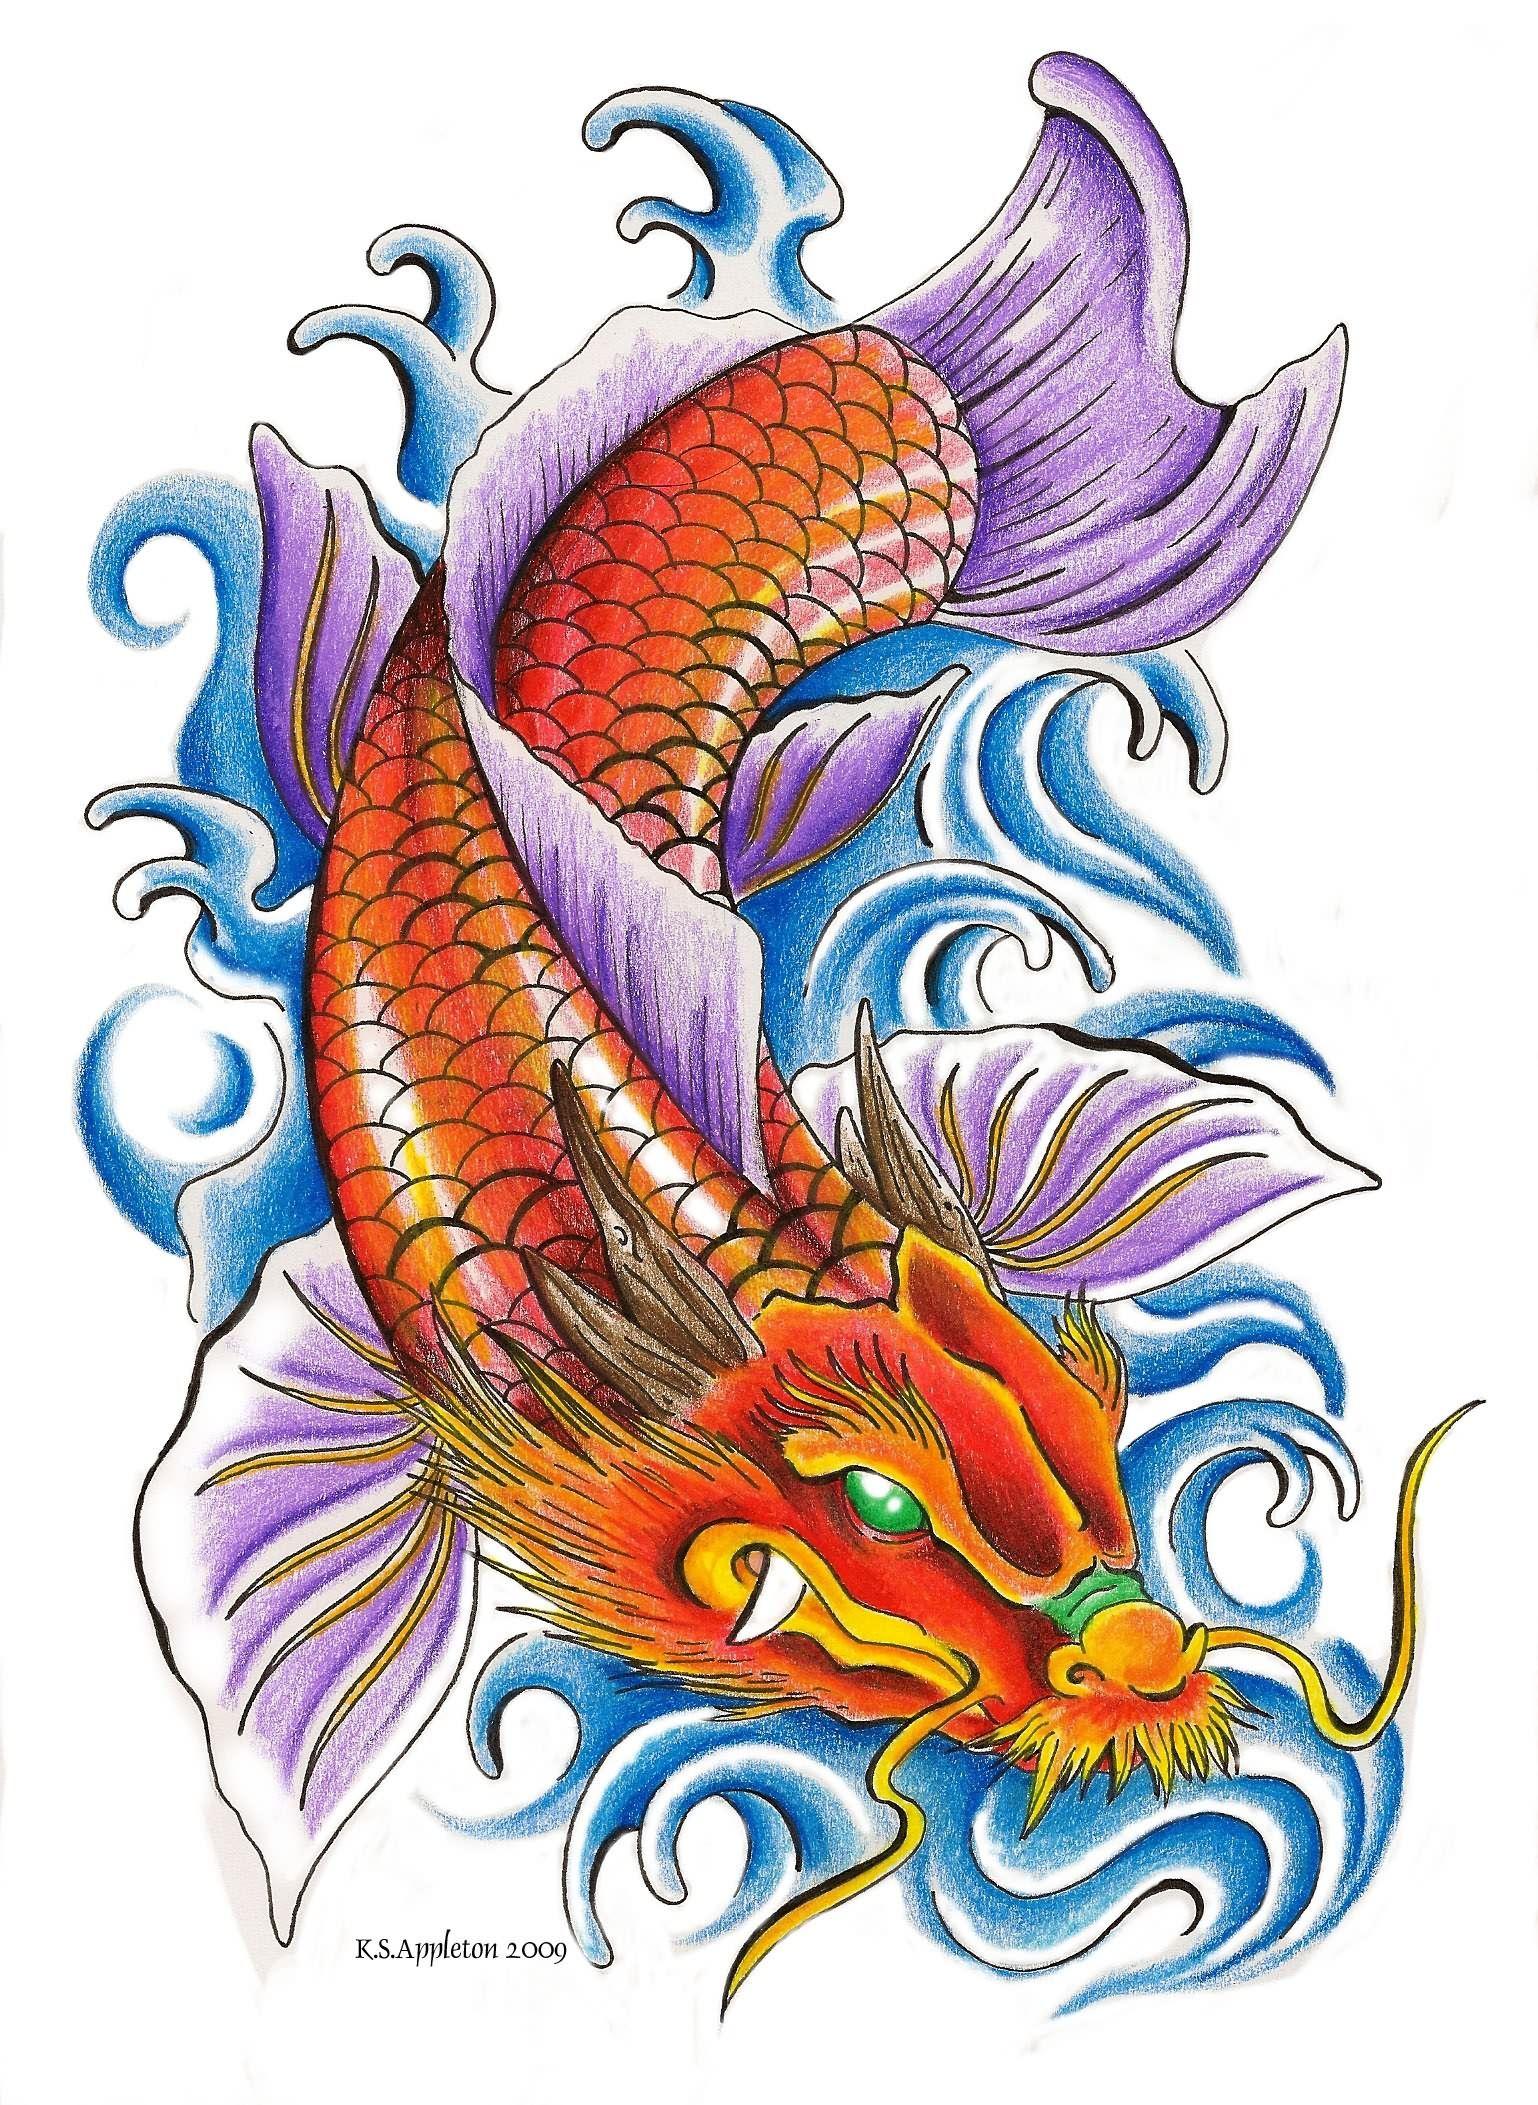 Dragon And Koi Fish Tattoo Sample | Dragon Tattoos | Koi ...Koi Fish Dragon Tattoo Designs